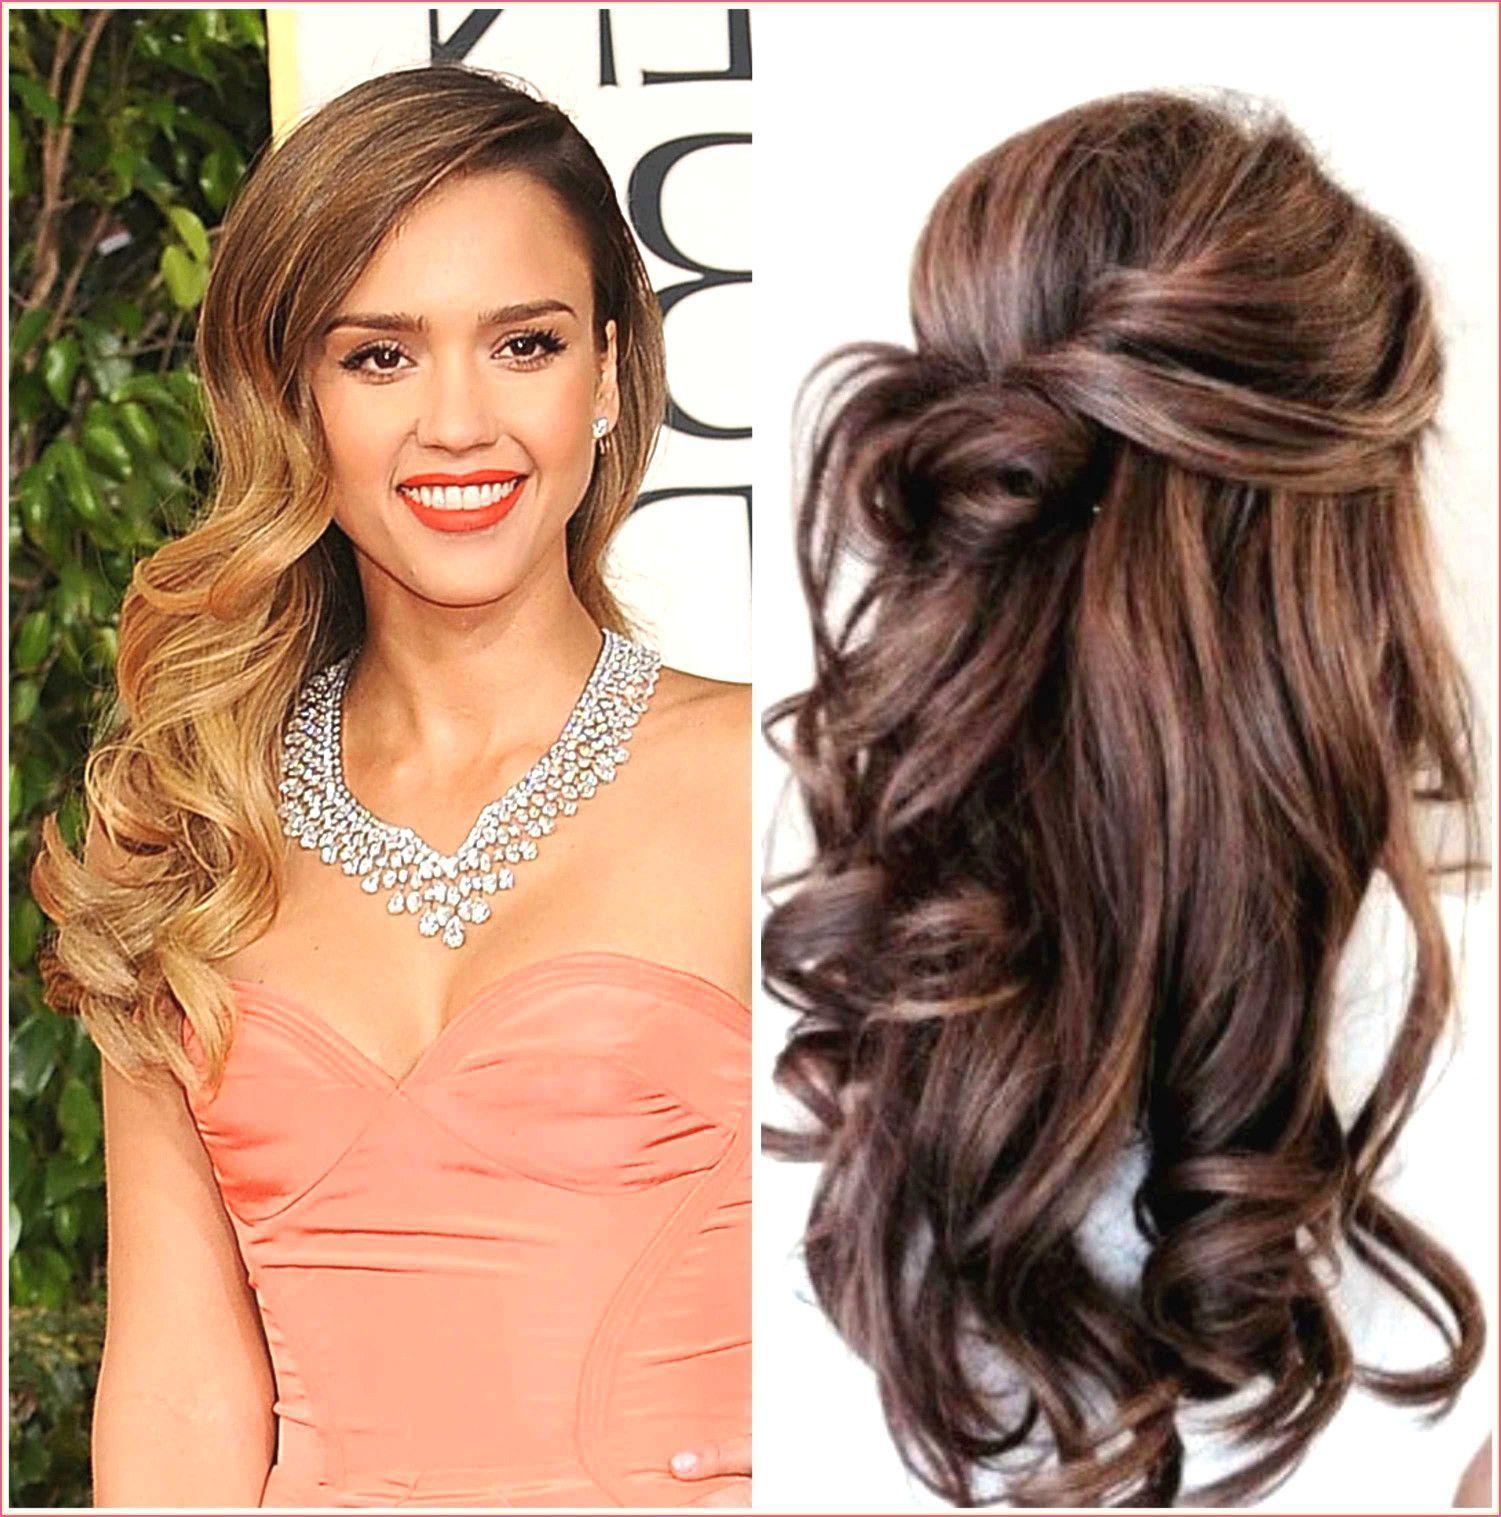 Lockiges Haar Formelles Lockige Haare Kurzhaarfrisuren Formelles Haare Kur Formelles In 2020 Medium Hair Styles Medium Length Hair Styles Long Hair Styles Men